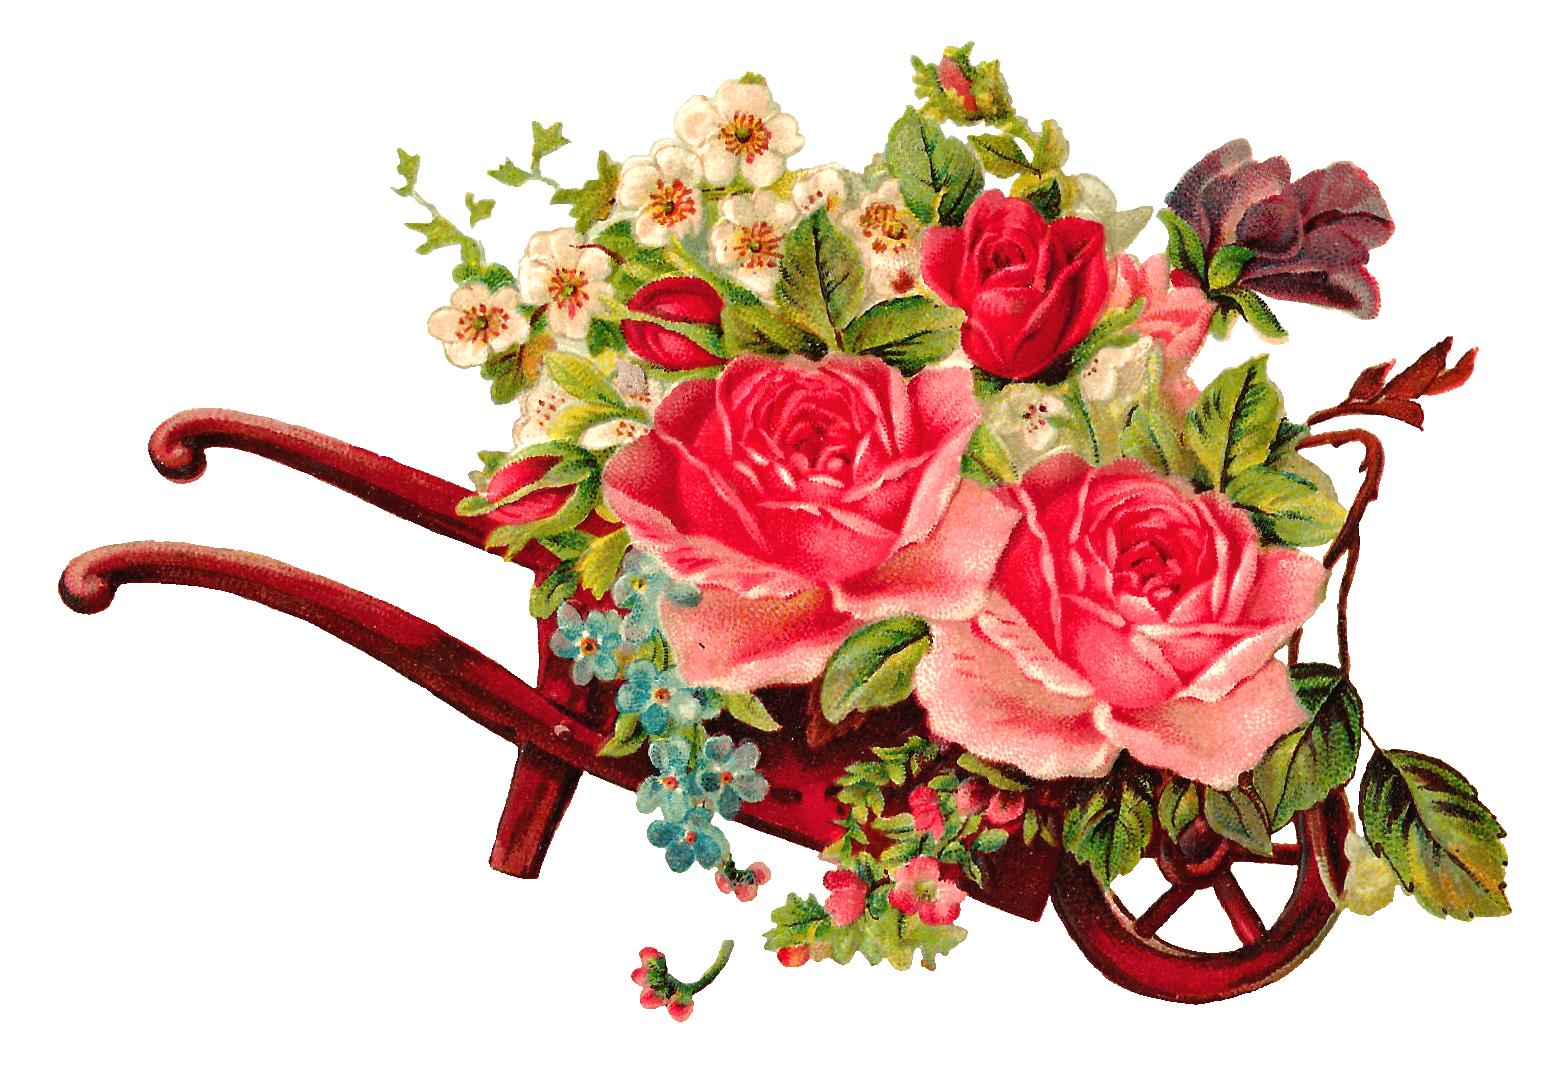 Clipart rose bunch. Antique images free digital